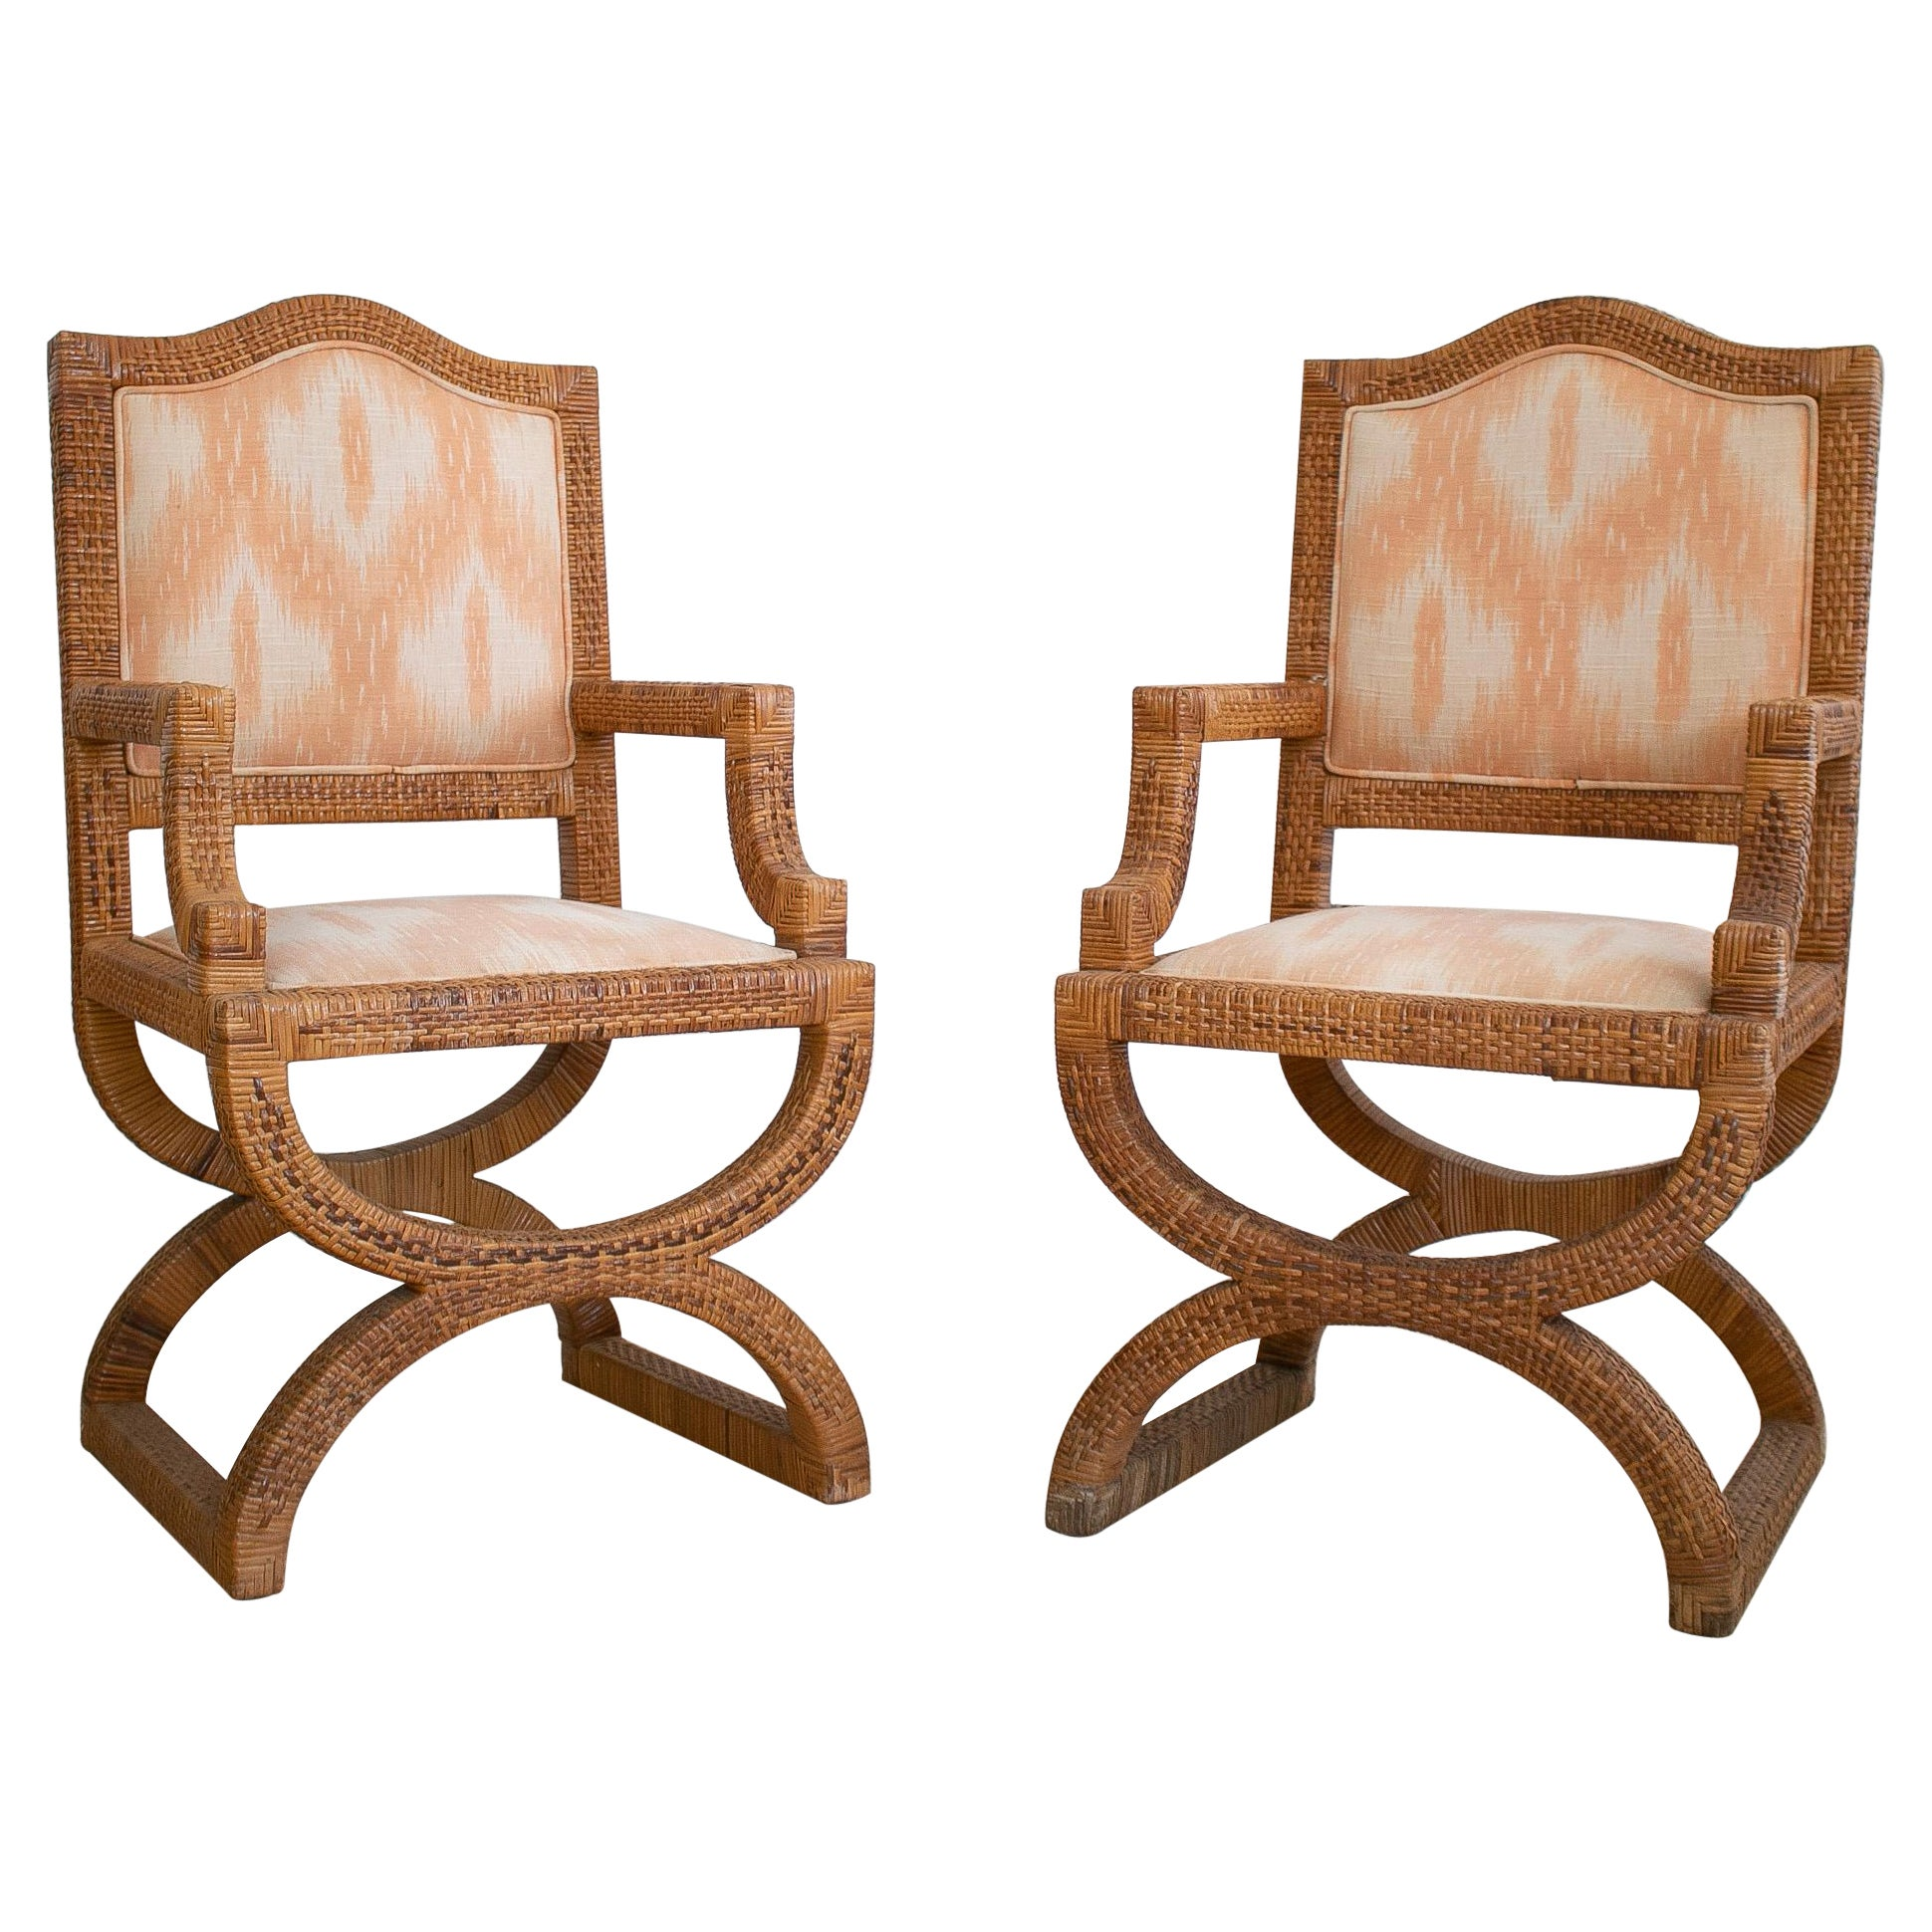 Pair of 1980s Spanish Woven Wicker Armchairs